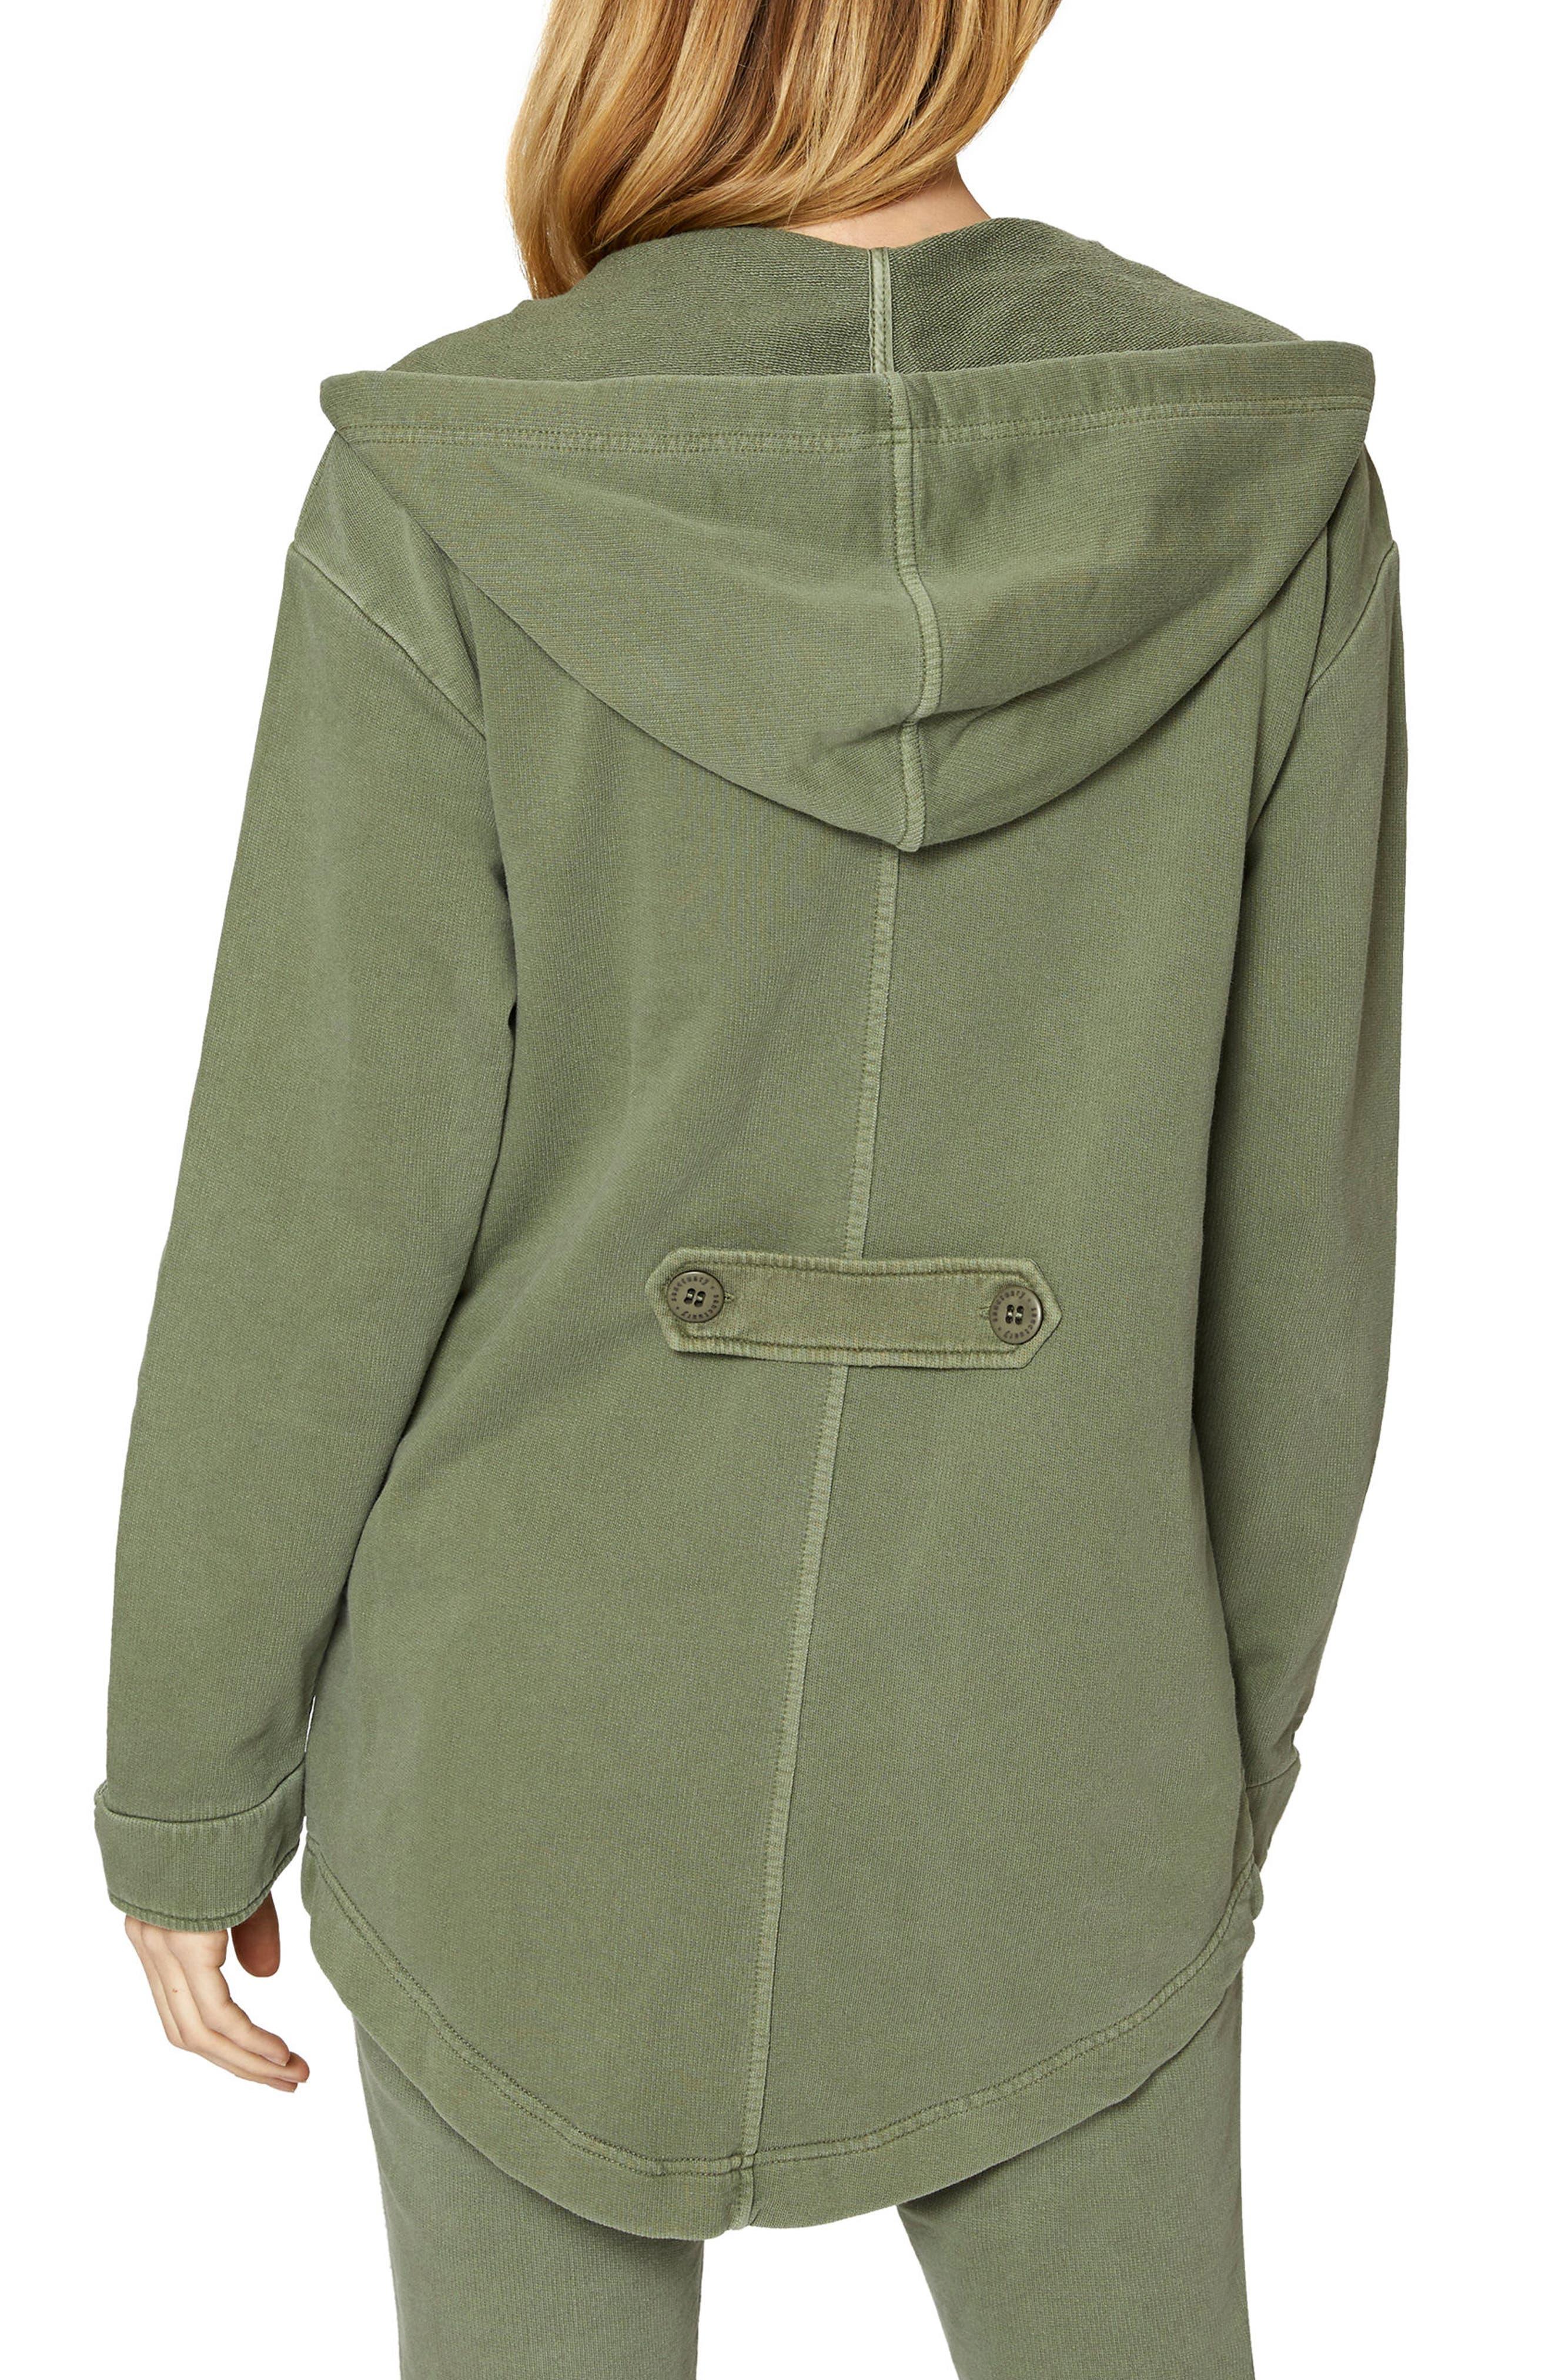 Top Rank Hooded Jacket,                             Alternate thumbnail 2, color,                             300